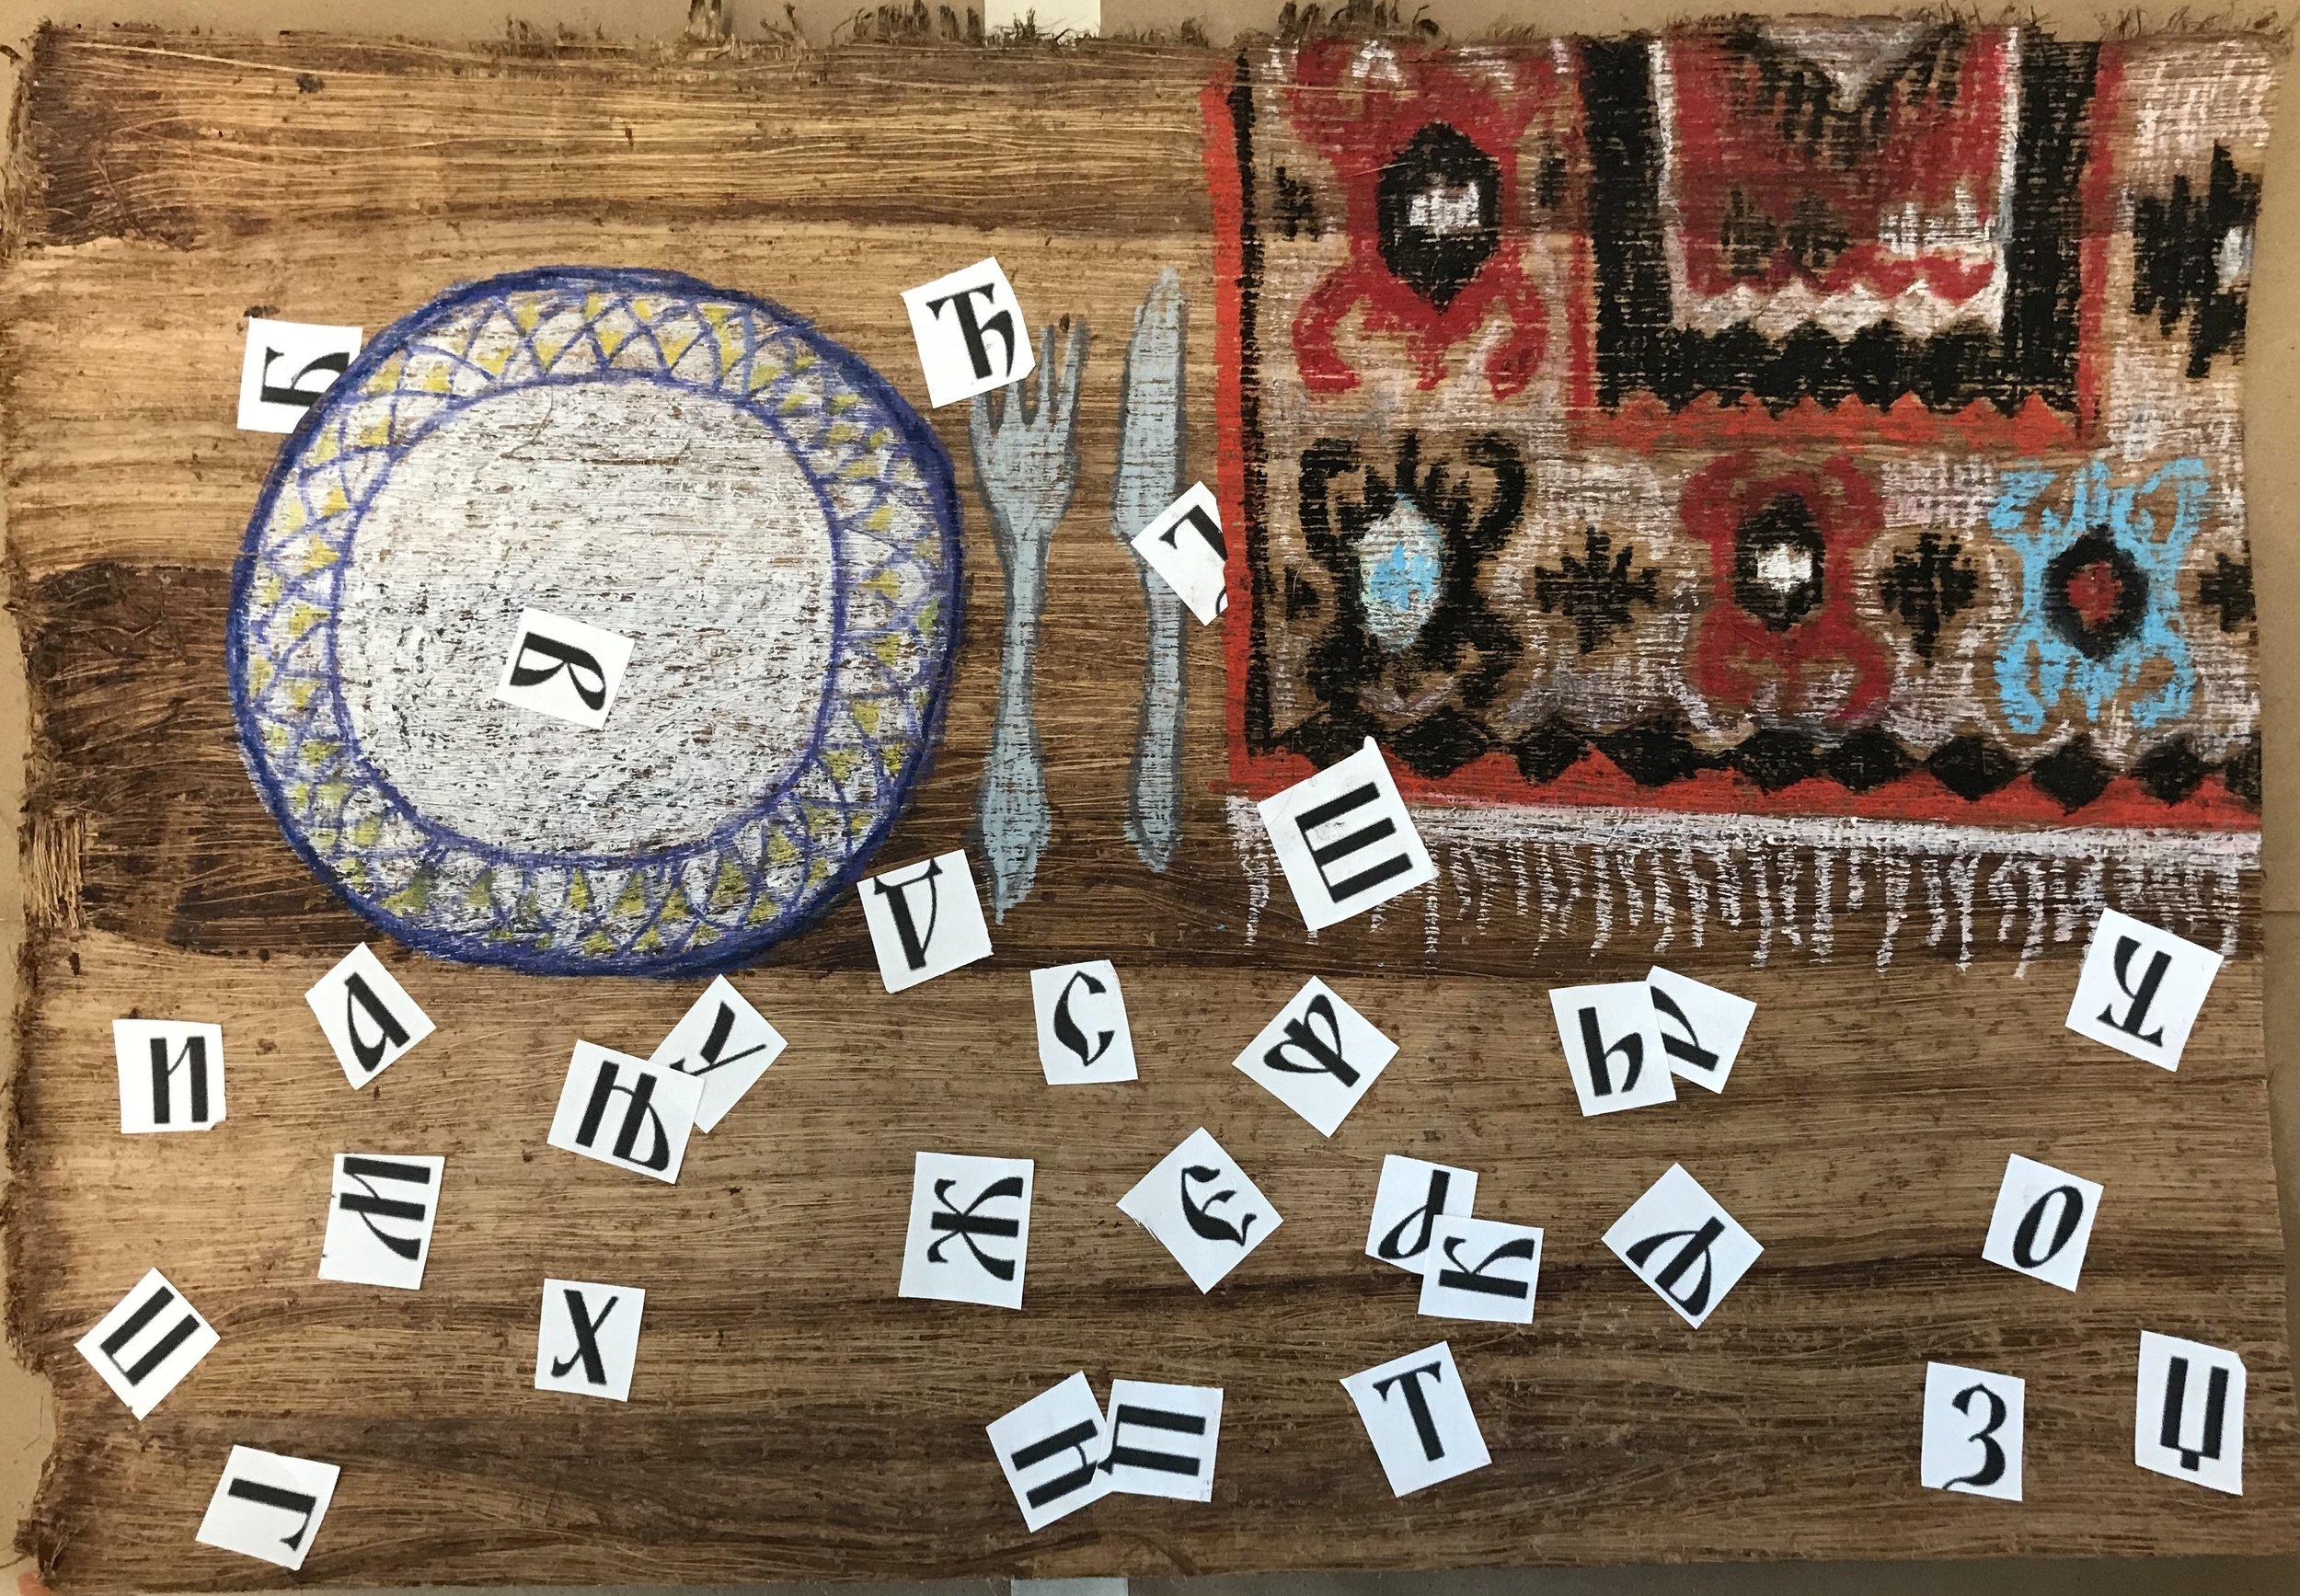 Bajc, Mart.  Zivot u Srbiji . 2017. Oil pastel and collage on Egyptian Papyrus. Santa Monica High School.